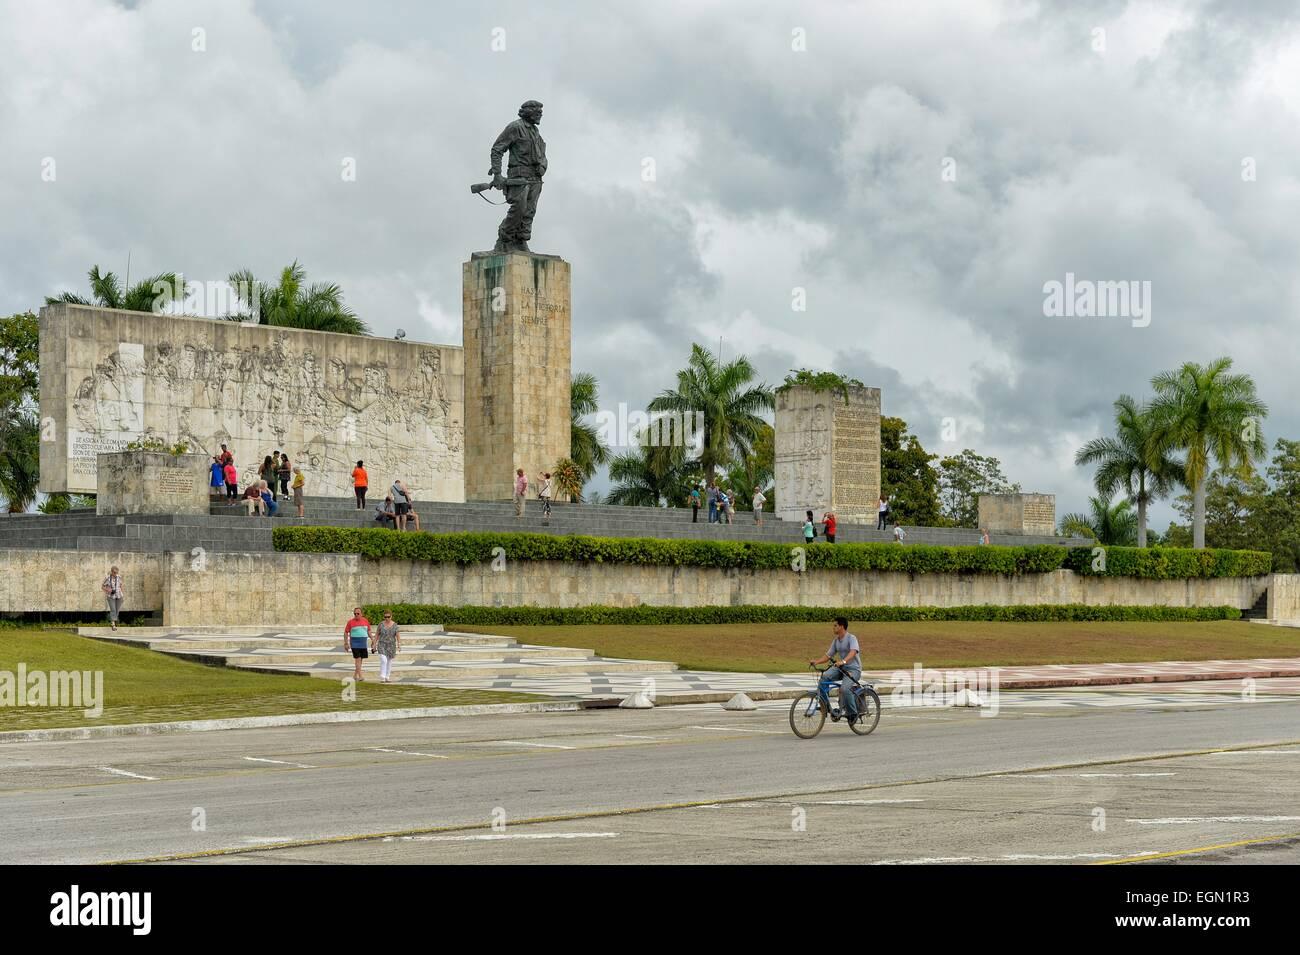 The tribute to Che Guevara at Santa Clara, Cuba. - Stock Image